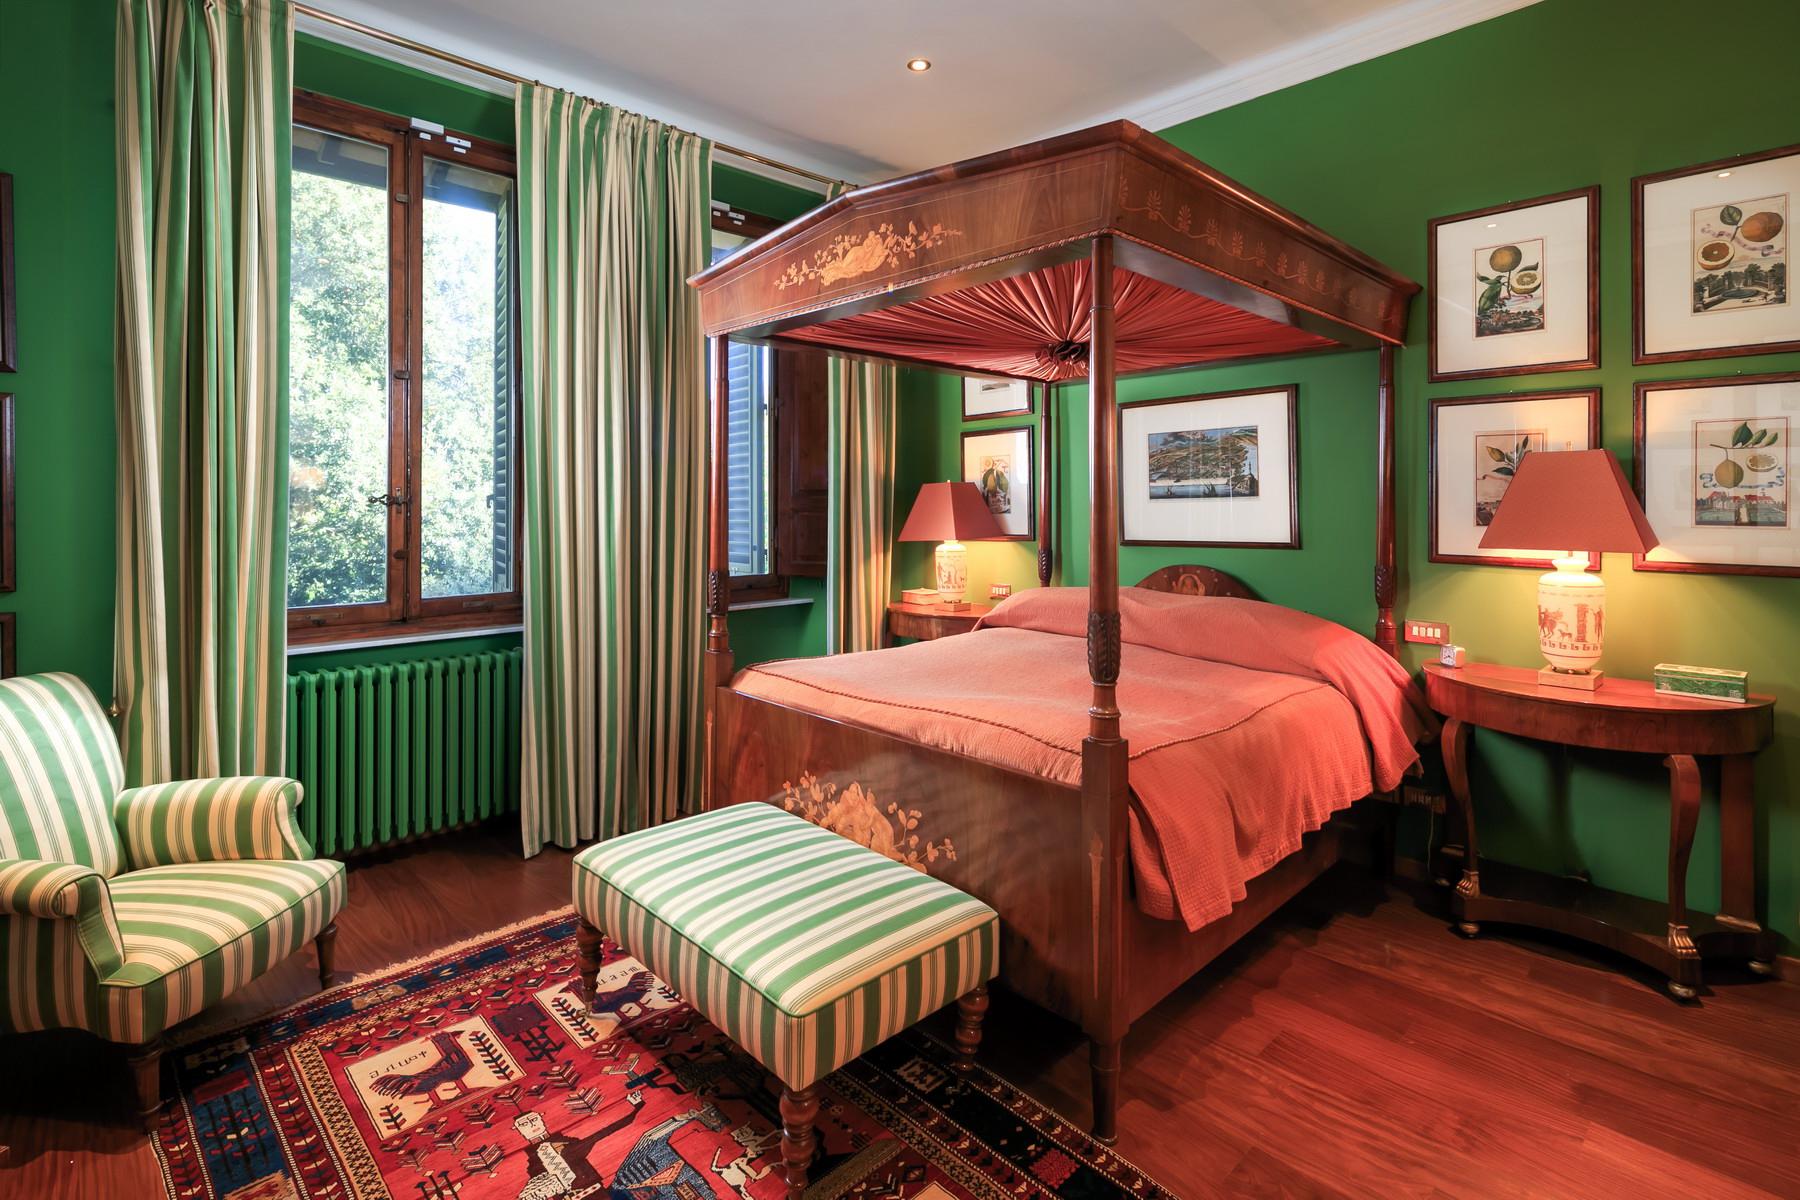 Villa in Vendita a Lucca: 5 locali, 900 mq - Foto 17